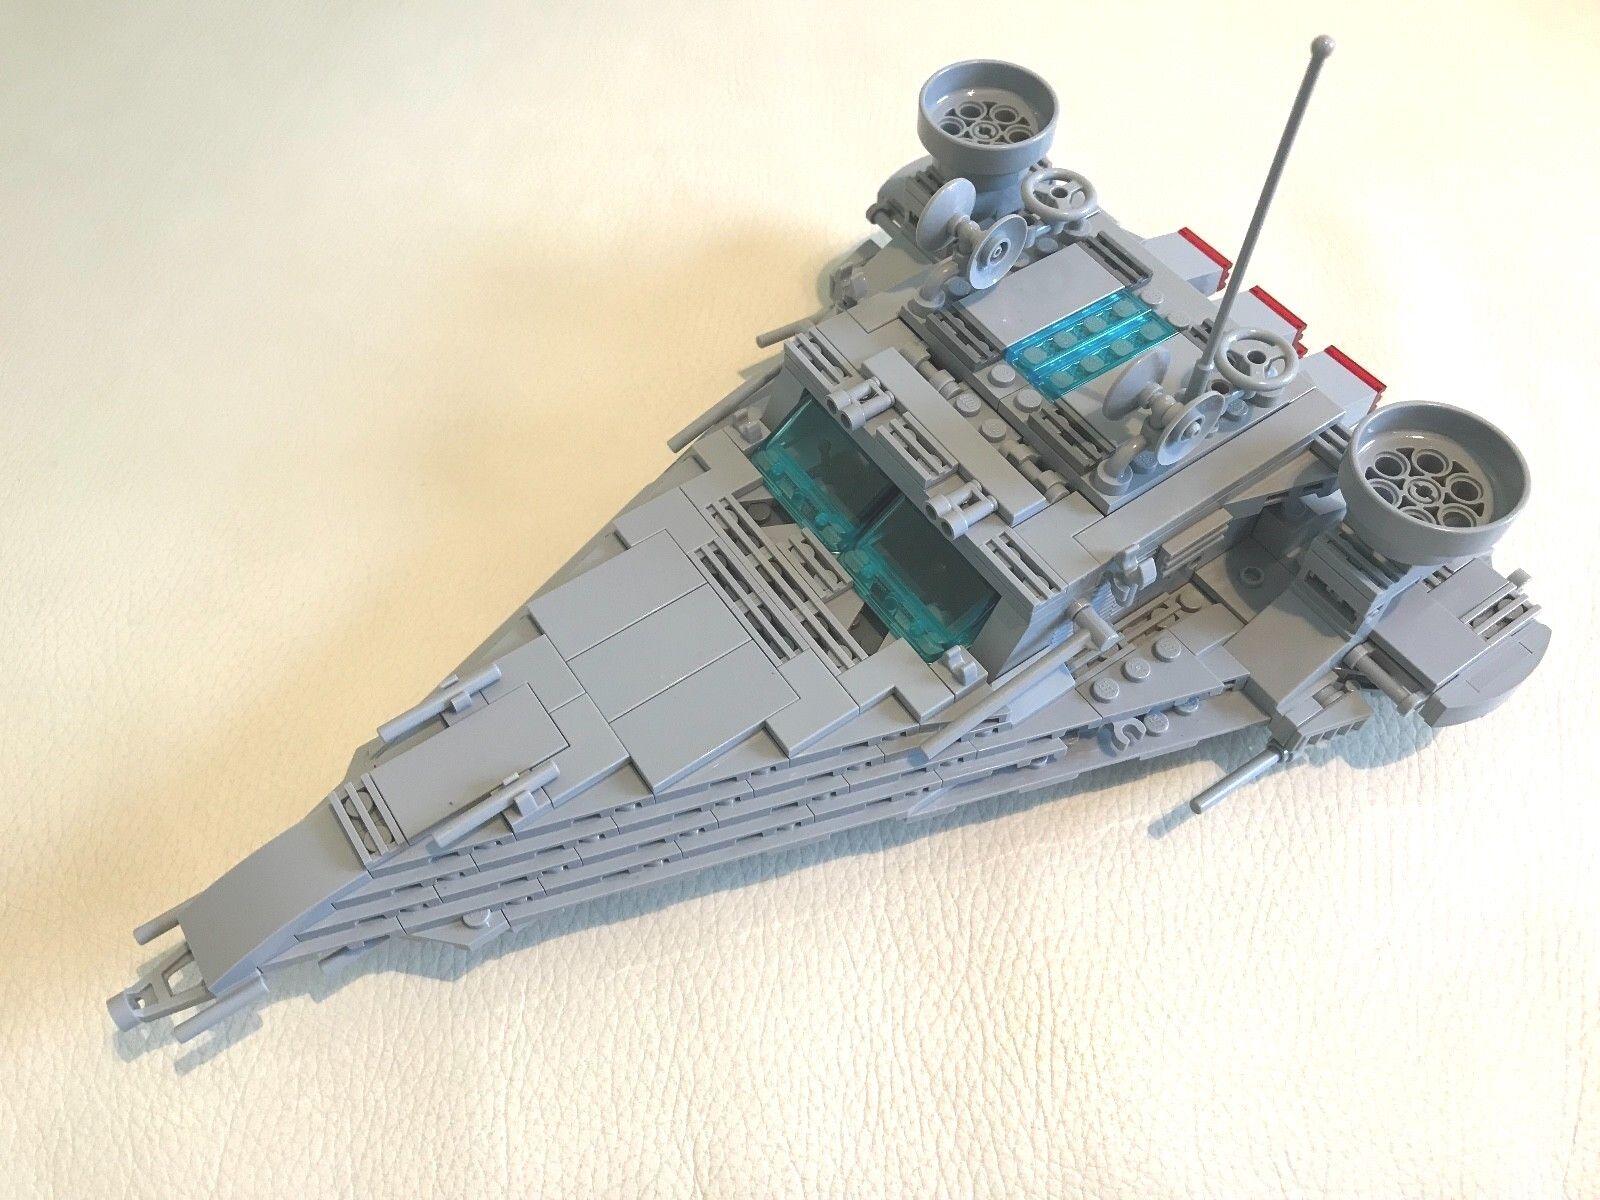 Lego STAR WARS - IMPERIAL DESTROYER - my my my design ver2 - 100% lego parts ONLY 4b80de